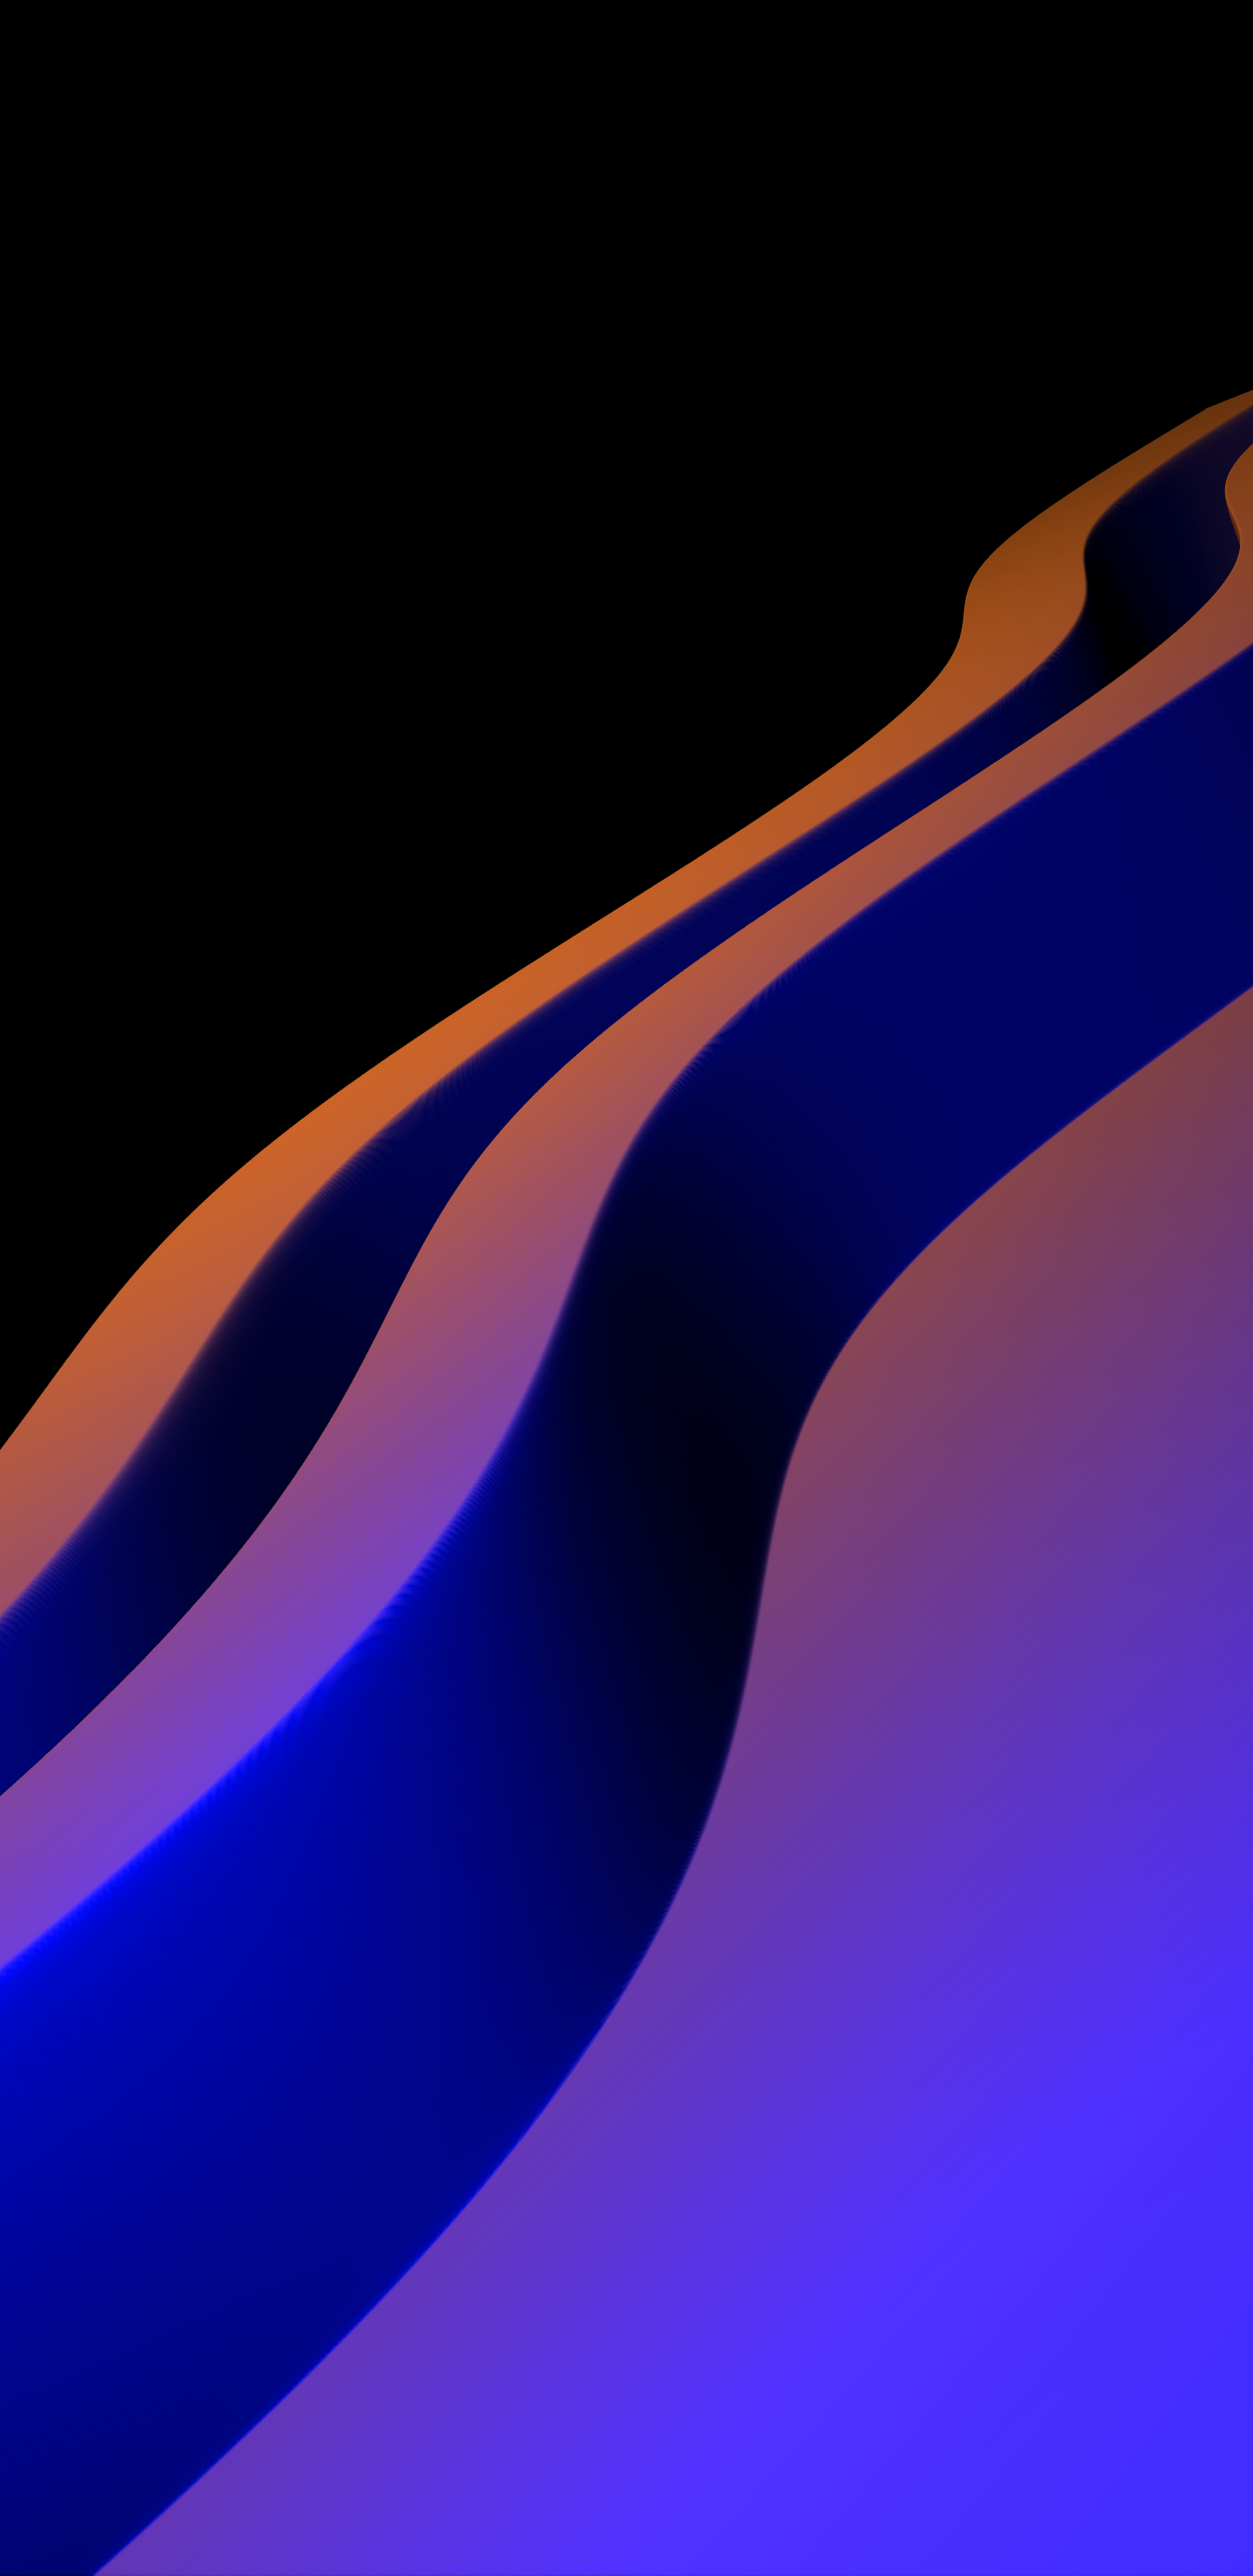 OnePlus 5 Wallpapers Amoled Black Edit 4k (2160x3840